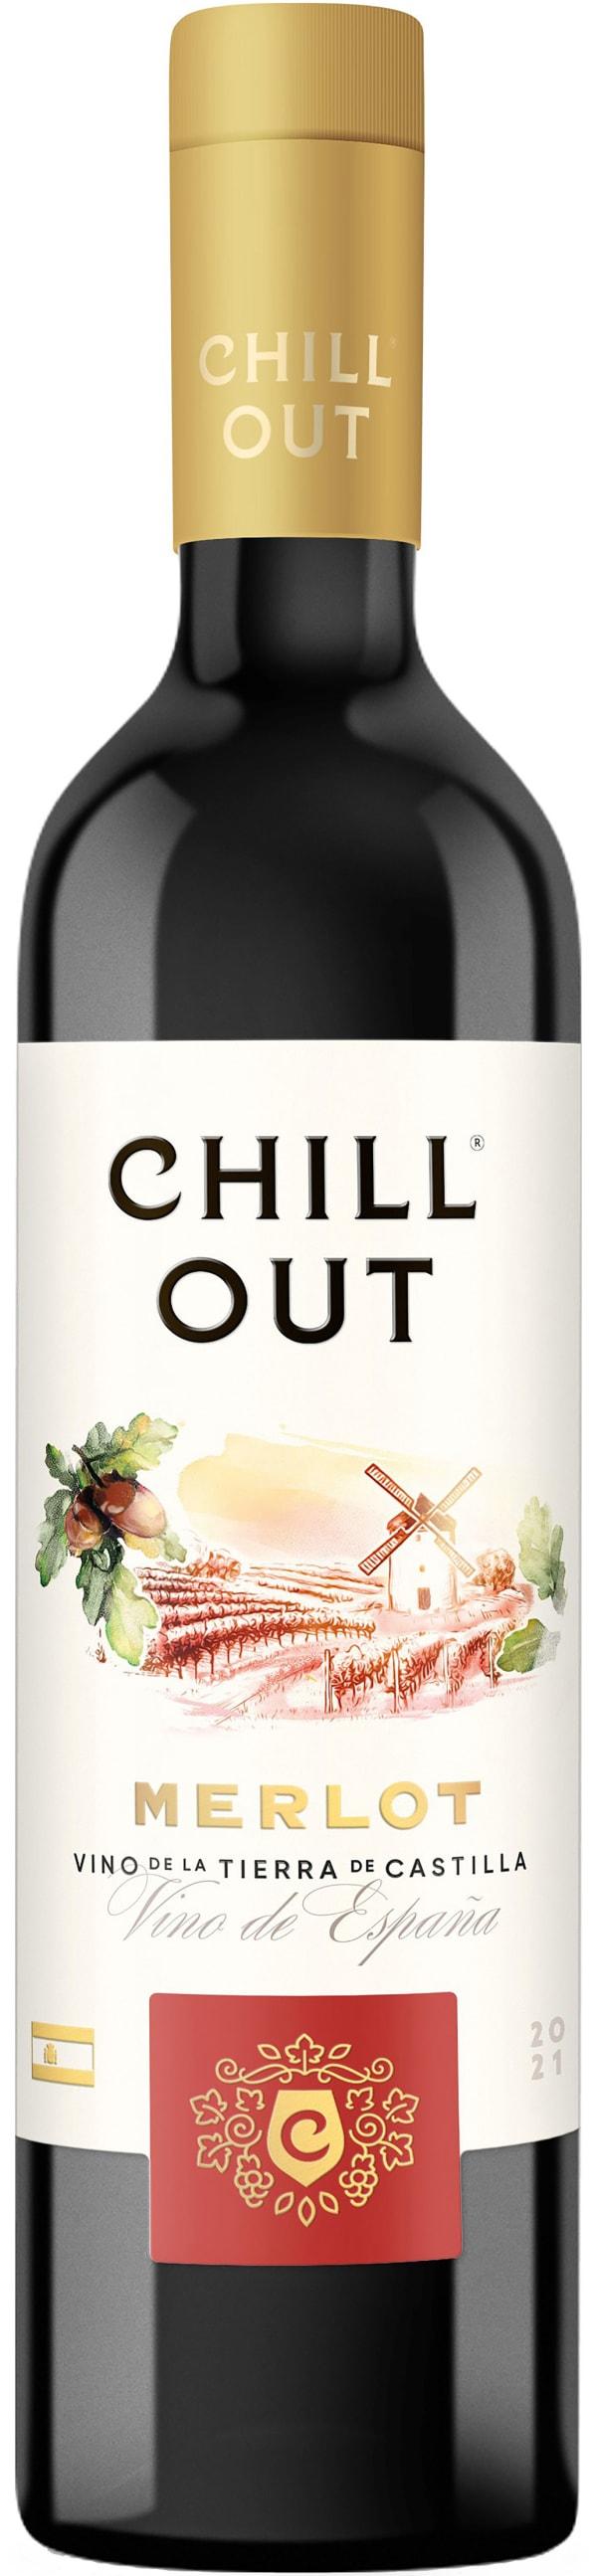 Chill Out Soft & Vibrant Merlot 2016 plastic bottle